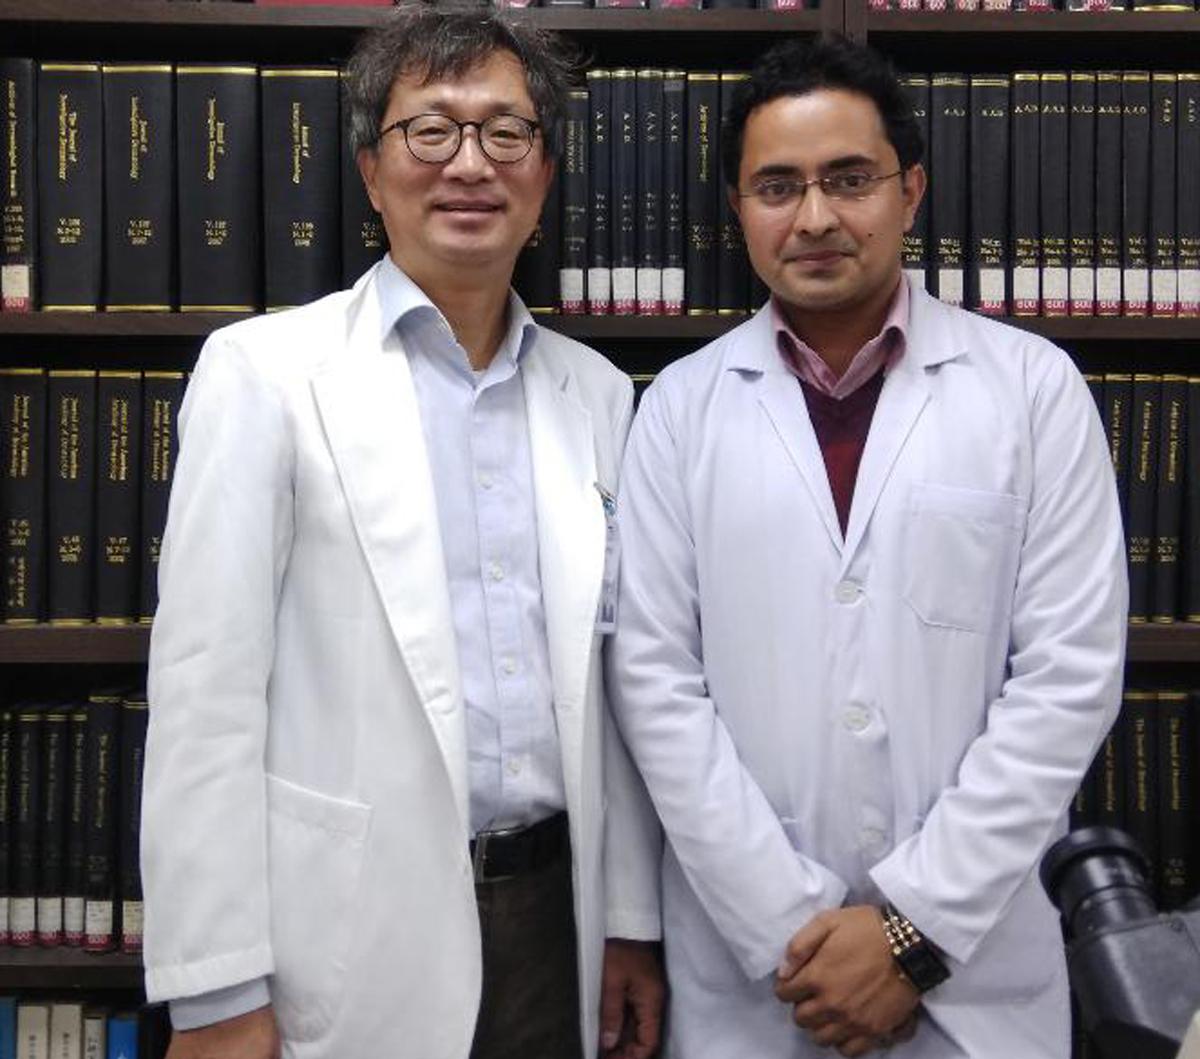 Dr Mrinal Gupta posing with a member of Korean Dermatological Association.